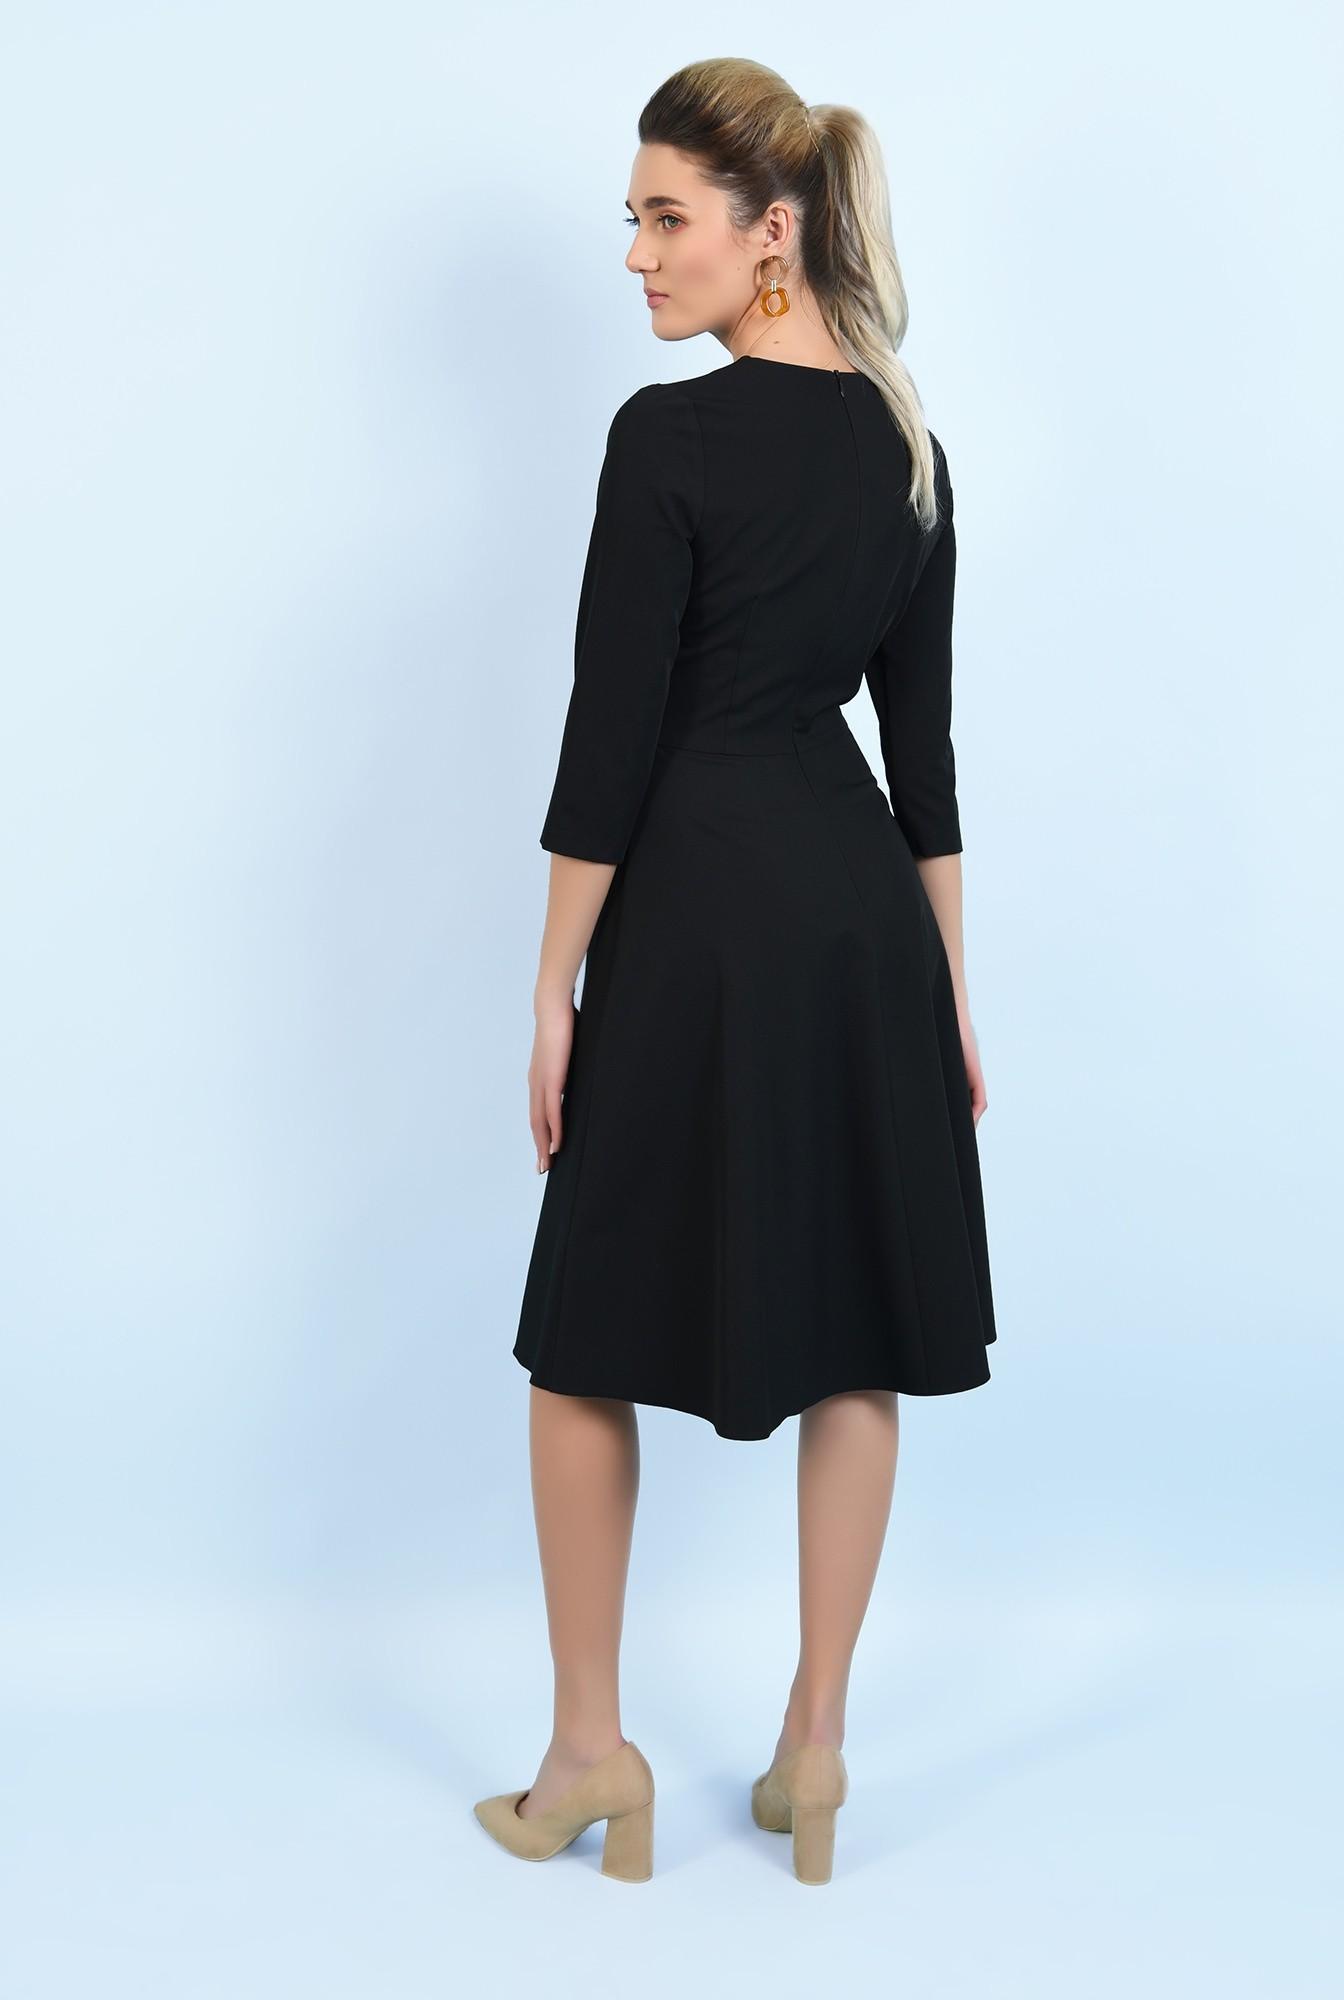 1 - 360 - rochie neagra, evazata, cu funde, rochie office, midi